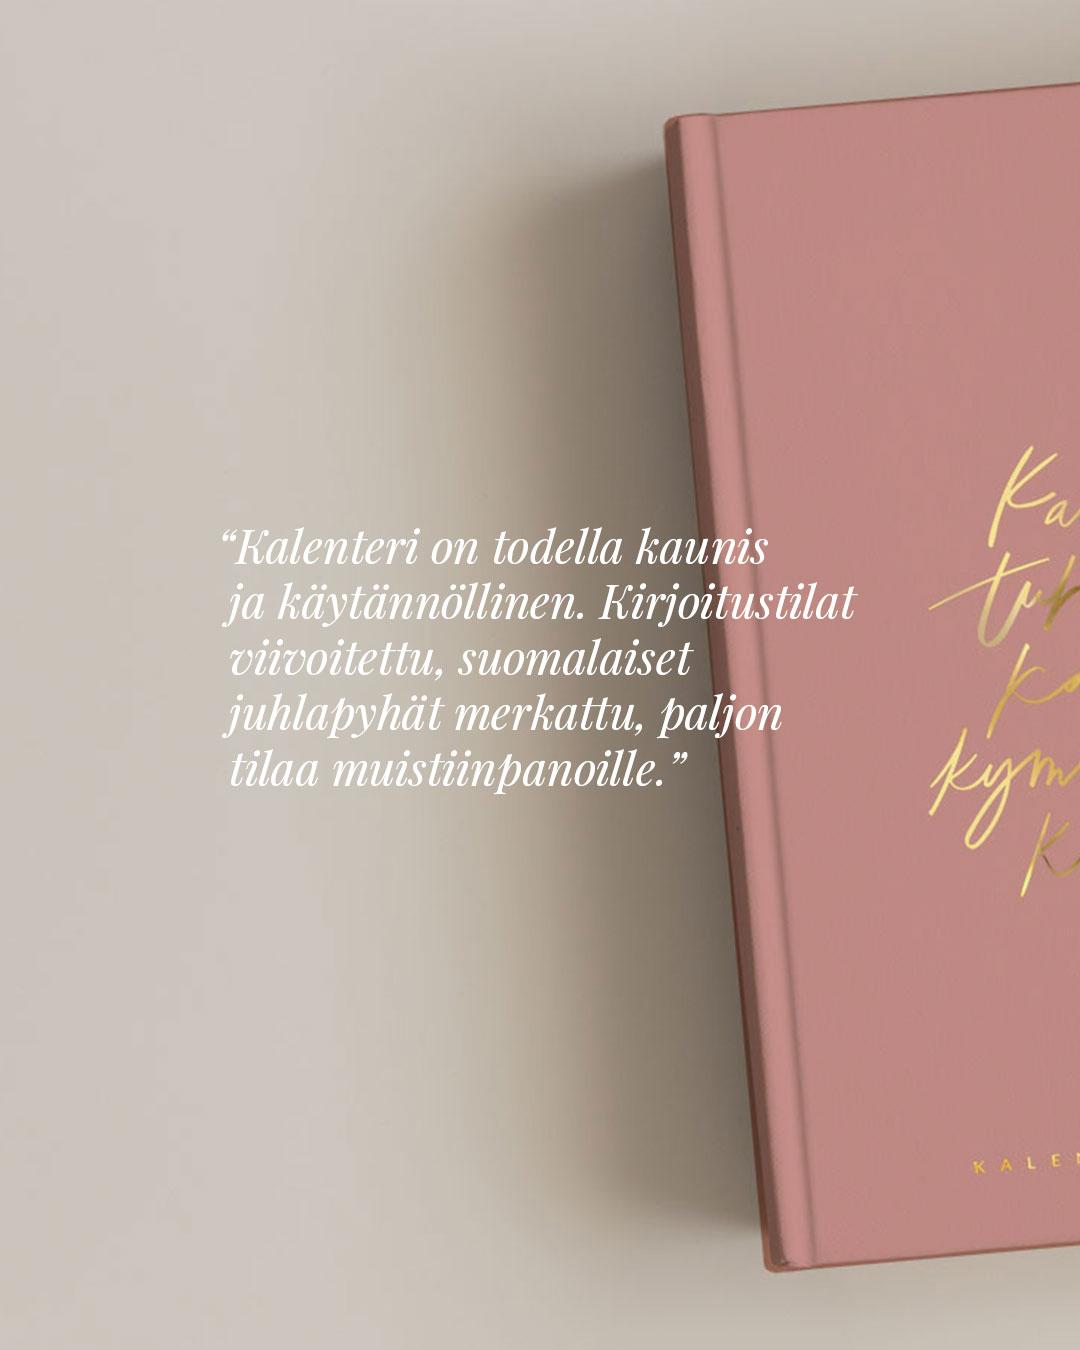 Kalenteri 2022 | Annika Välimäki 3